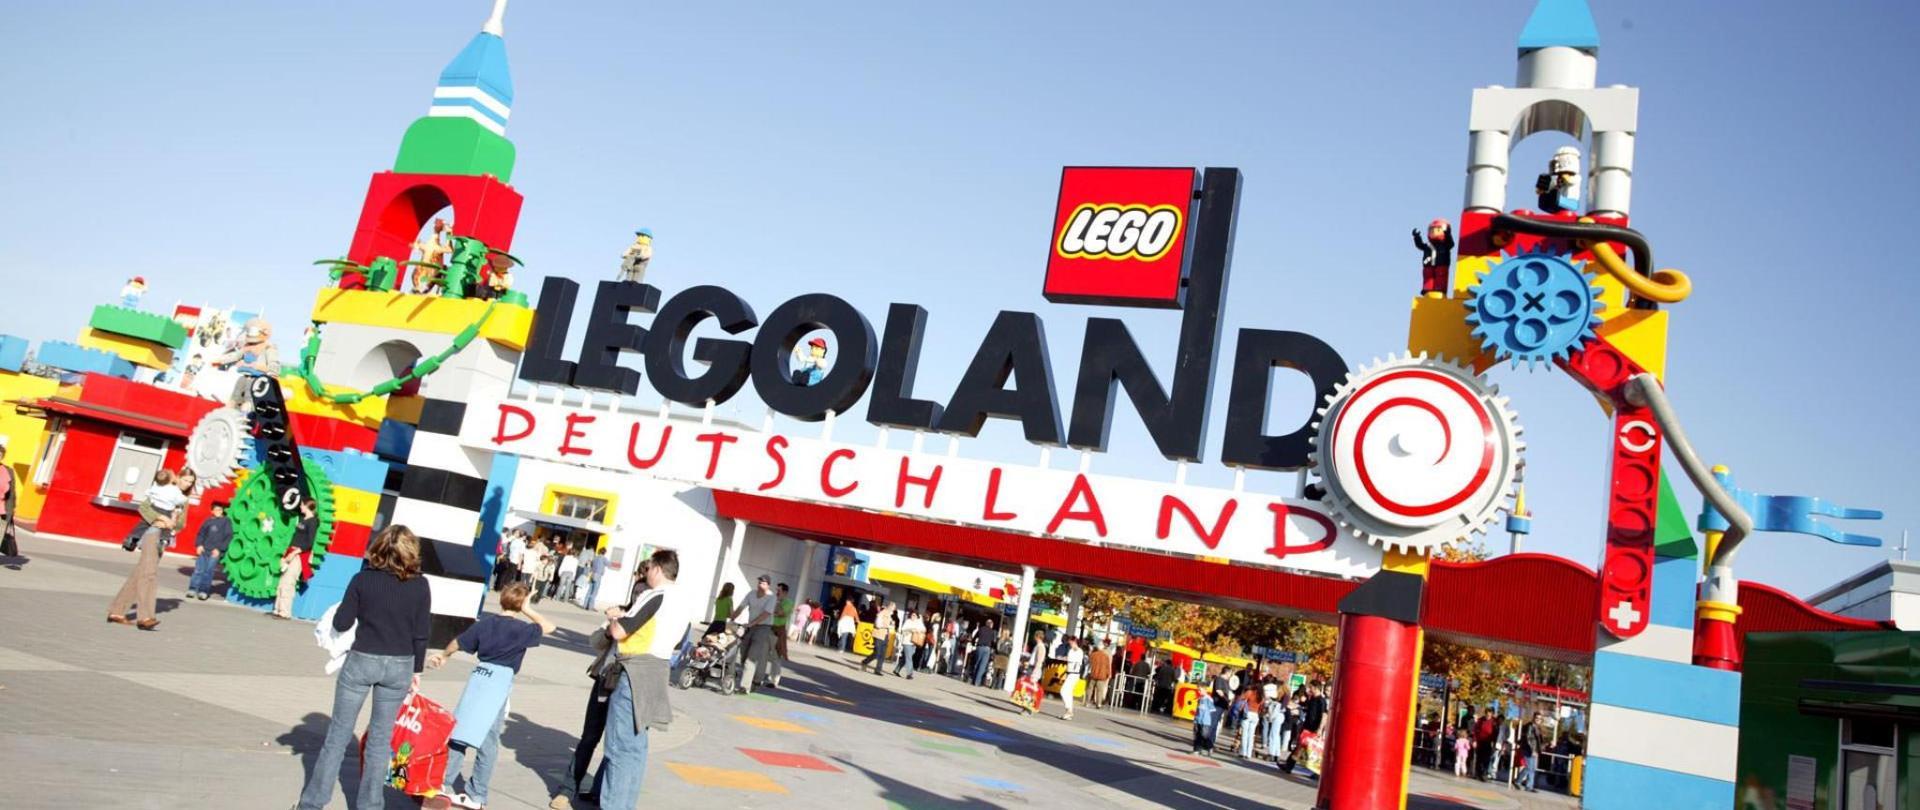 Familie_Legoland_Eingang.1920x1080m1.51.jpg